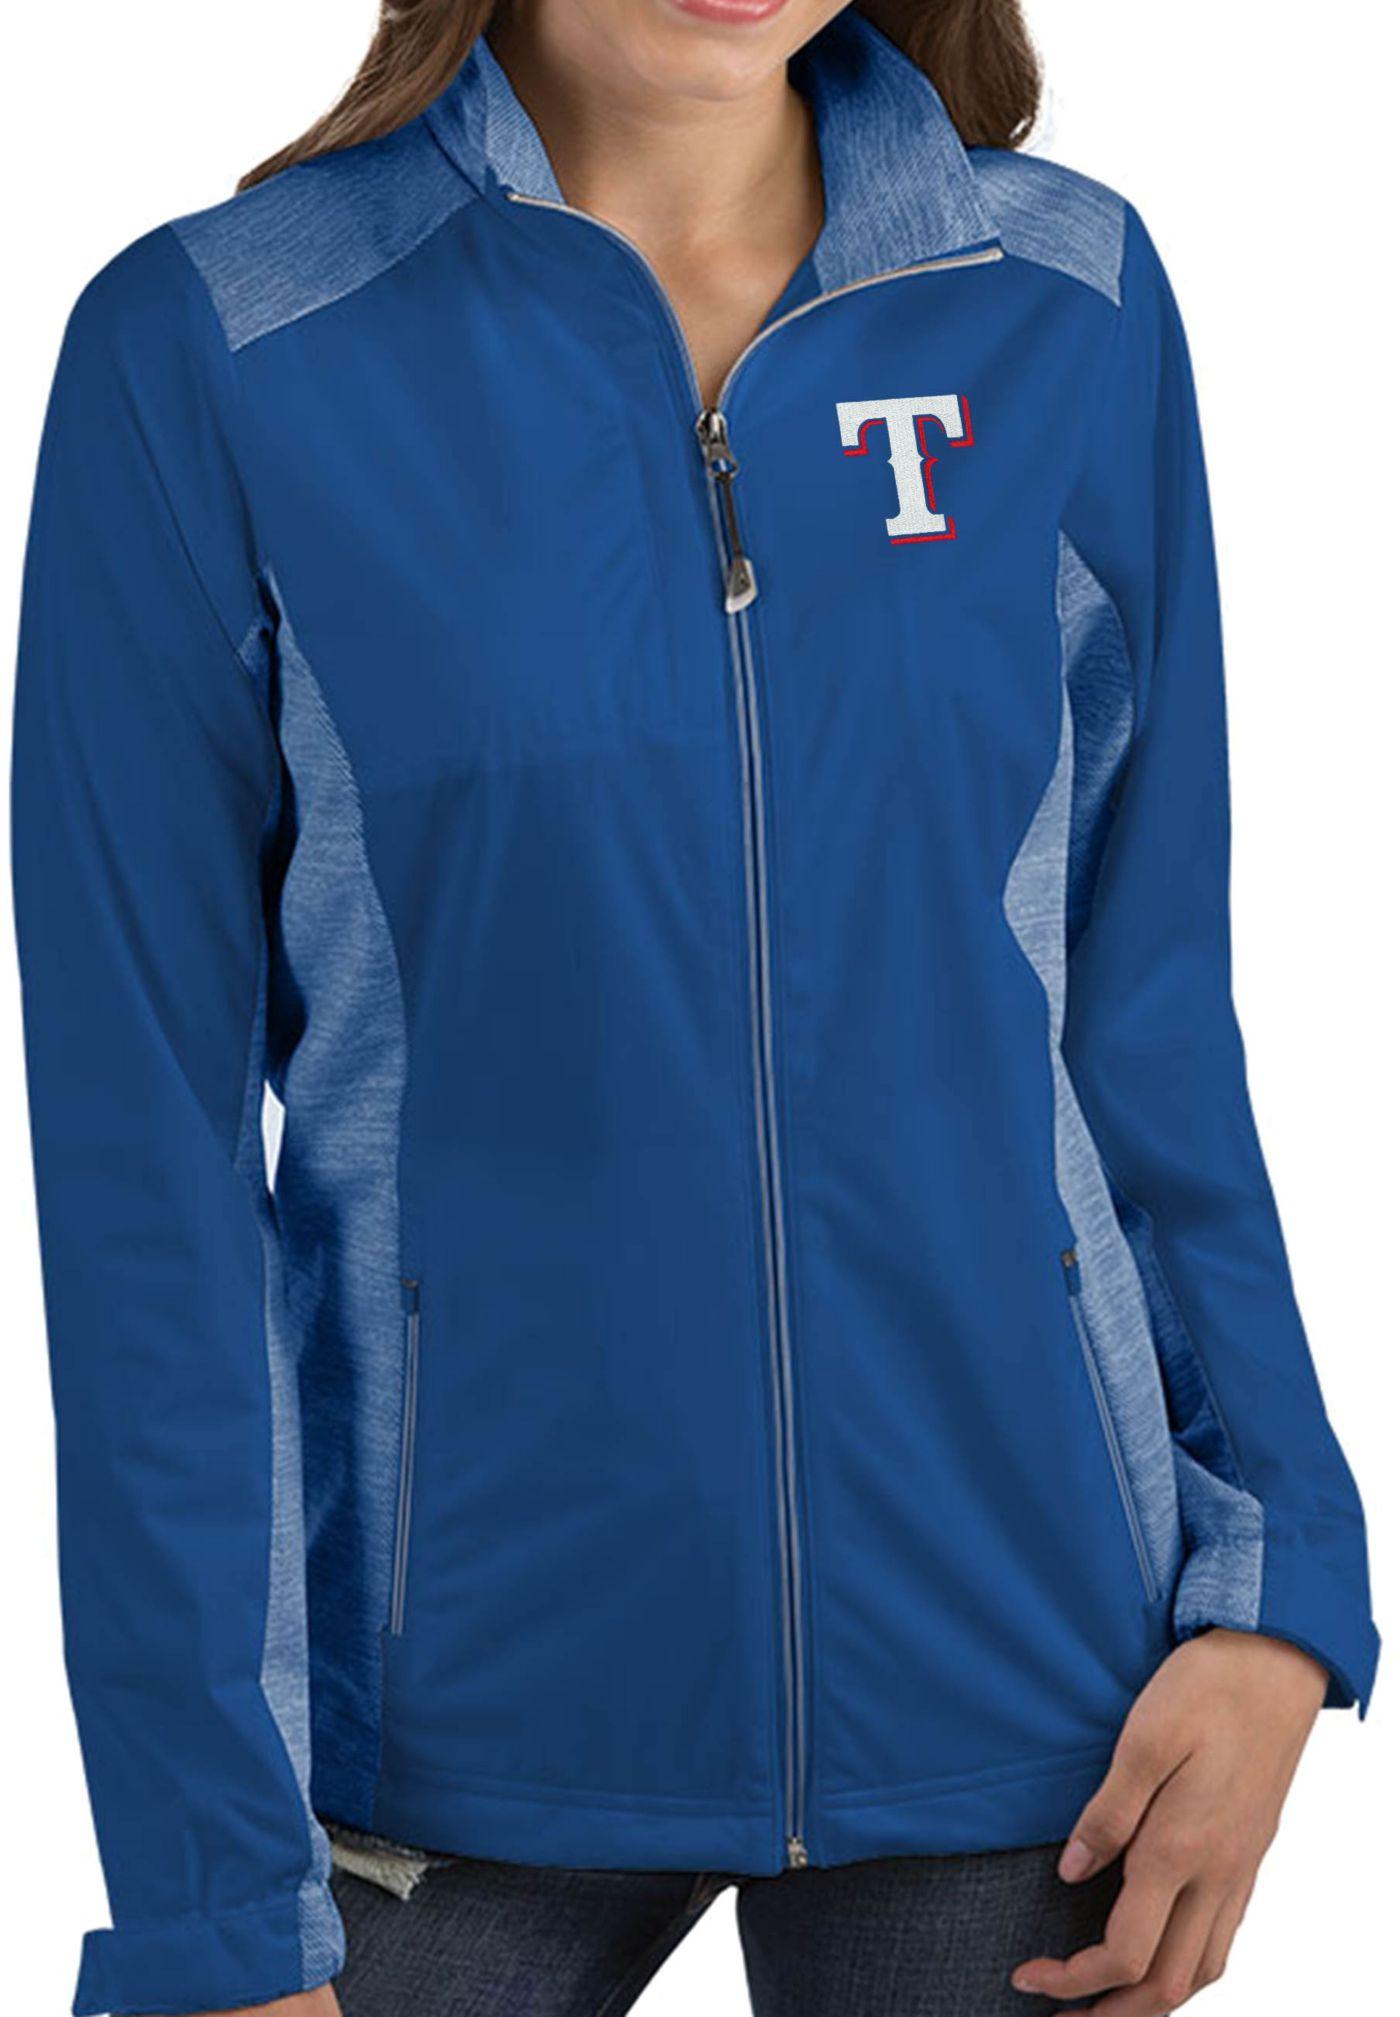 Antigua Women's Texas Rangers Revolve Royal Full-Zip Jacket